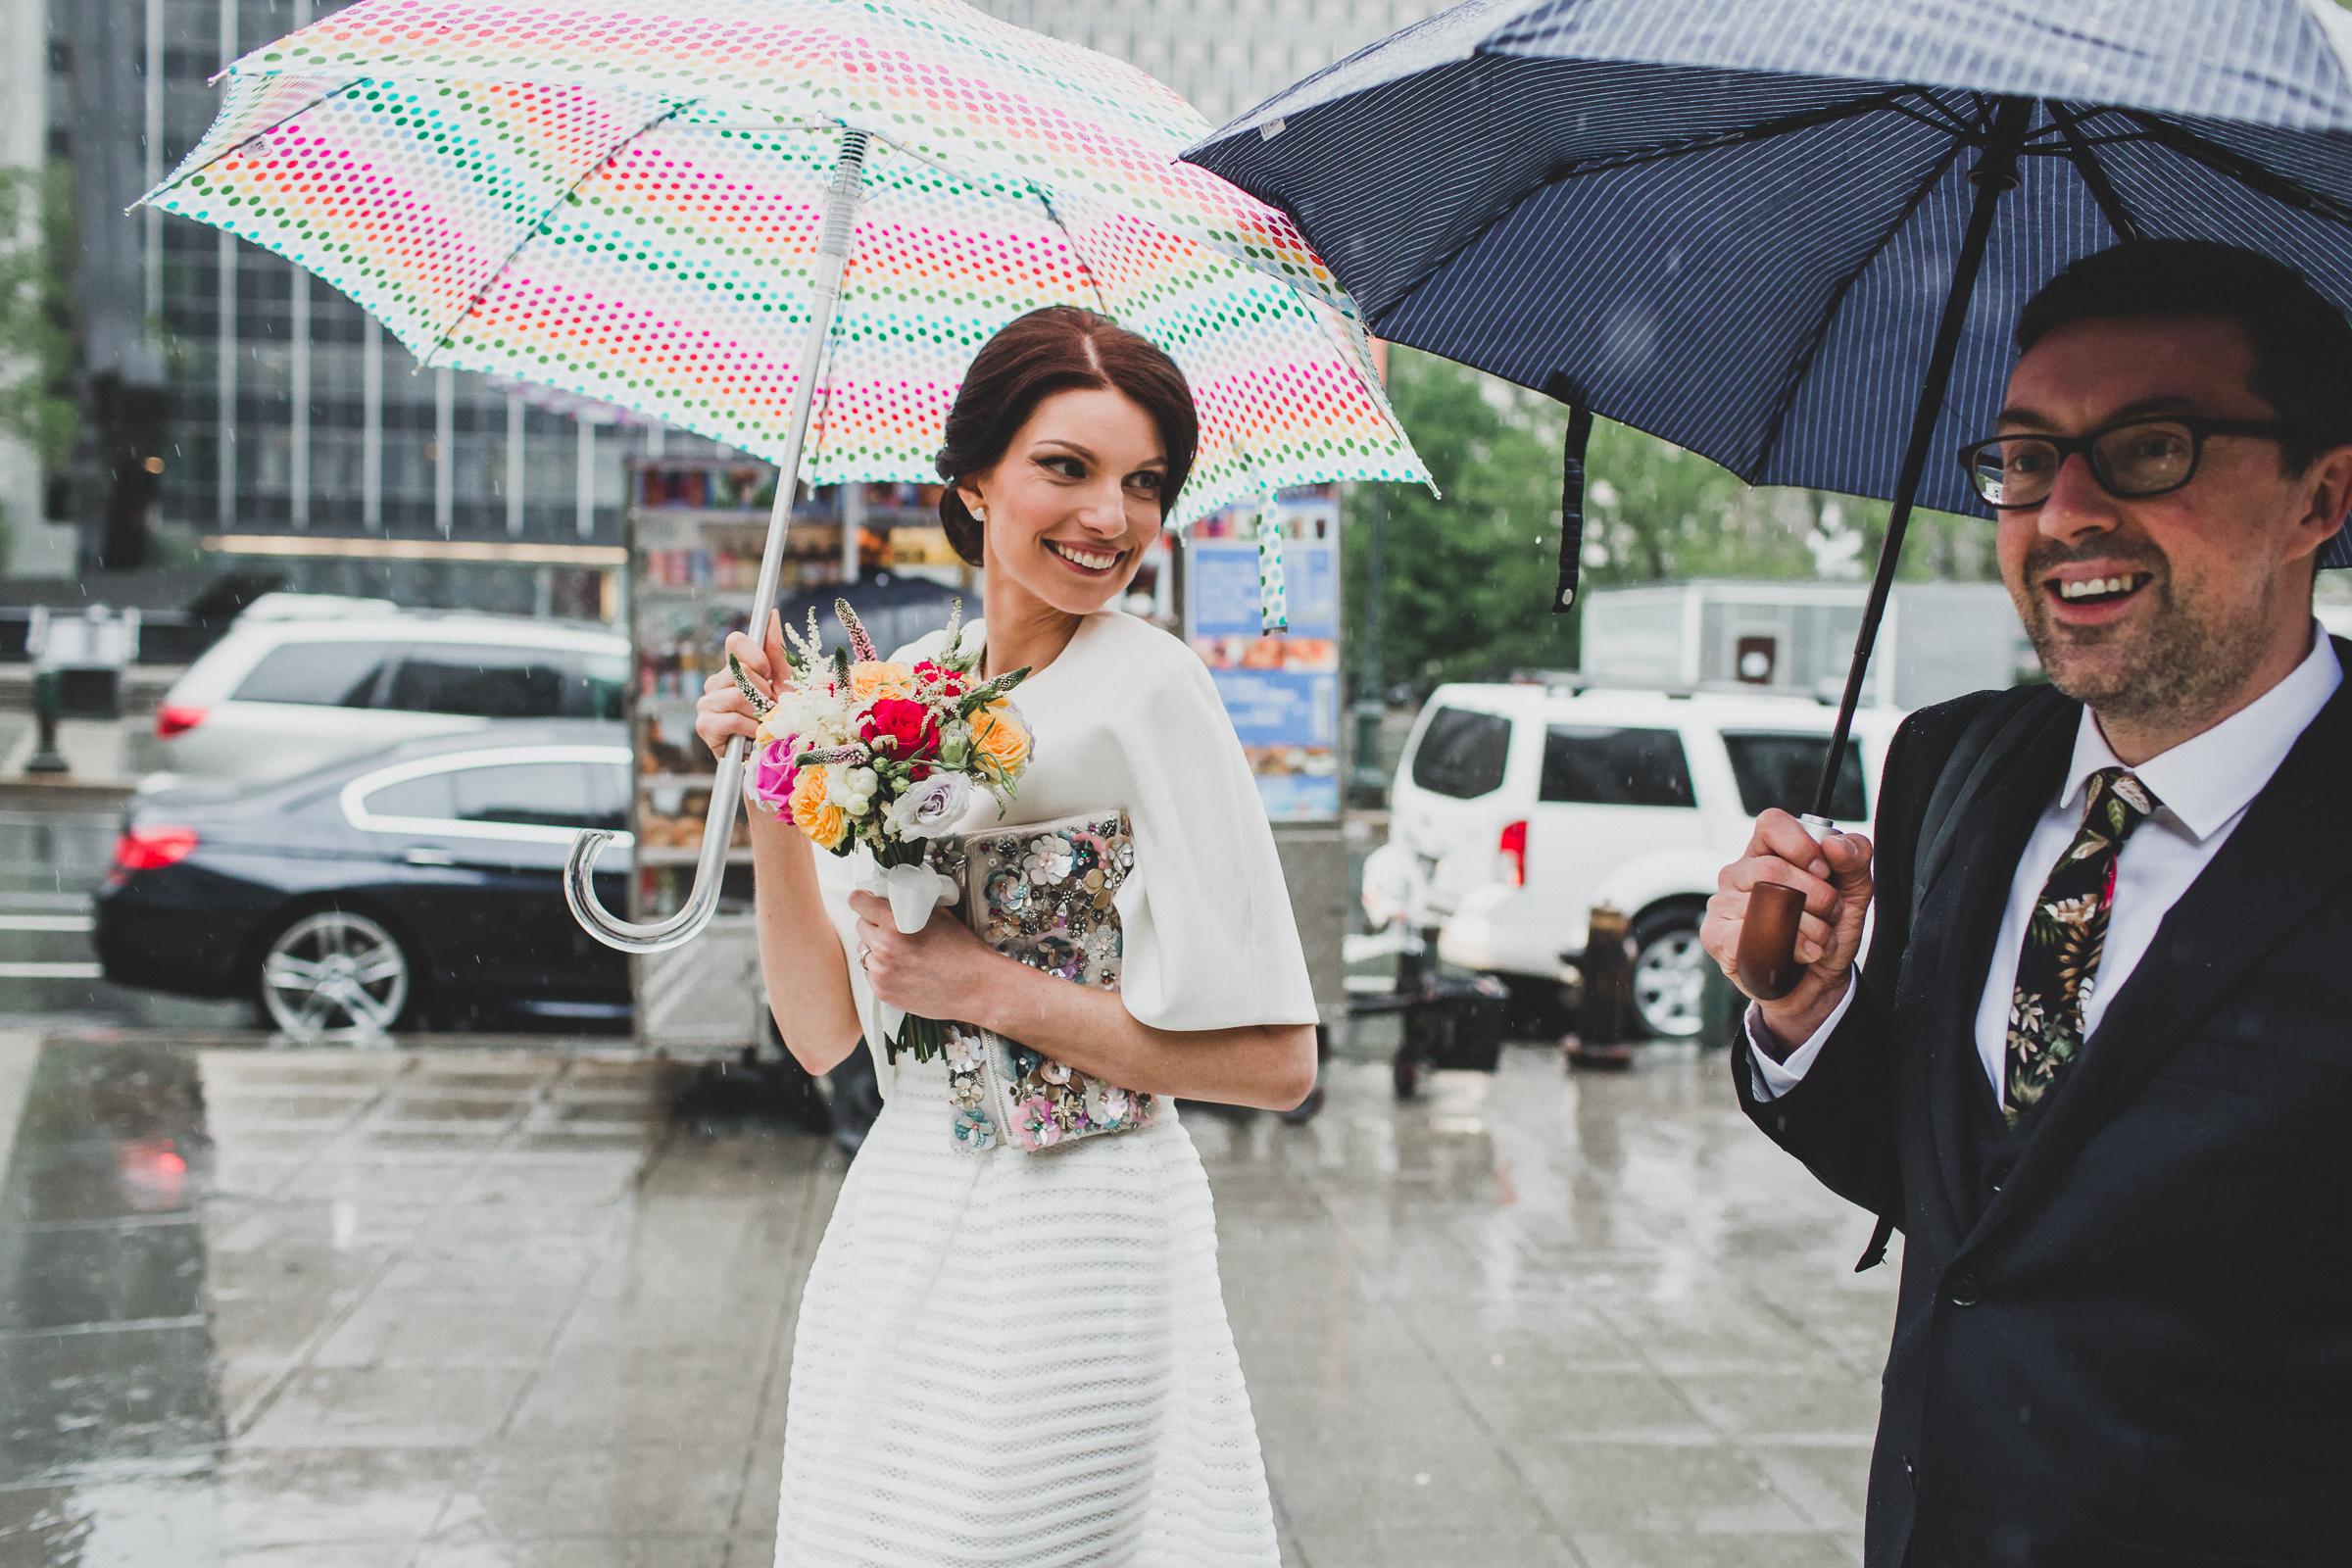 New-York-Documentary-Wedding-Photography-Best-Of-2017-by-Elvira-Kalviste-Photography-45.jpg